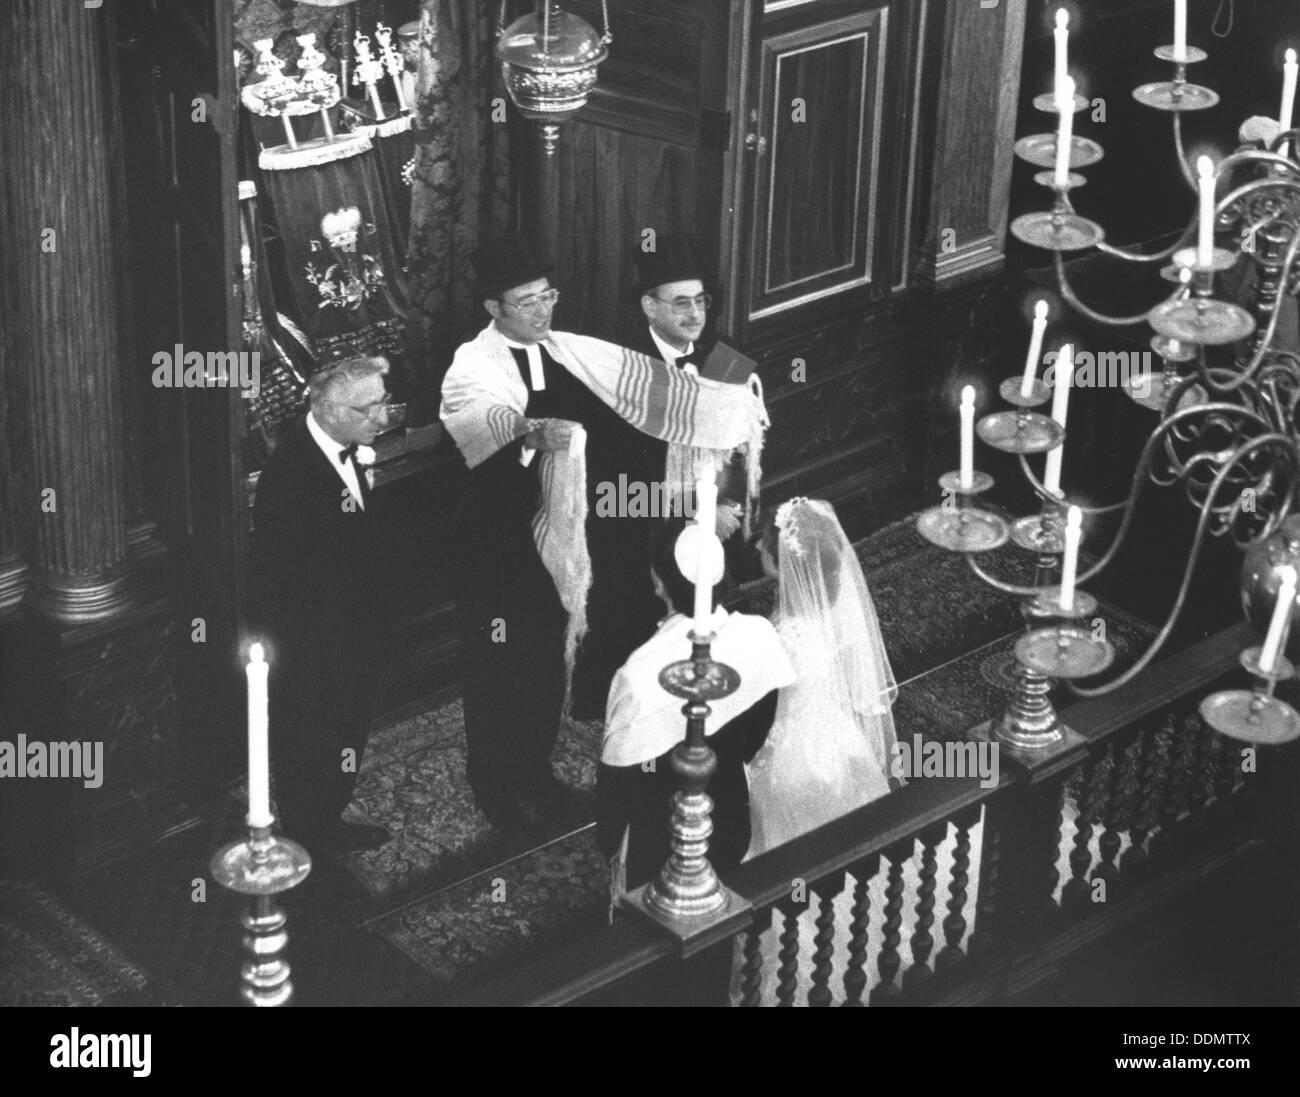 Jewish marriage ceremony, 1988. Artist: Sidney Harris - Stock Image